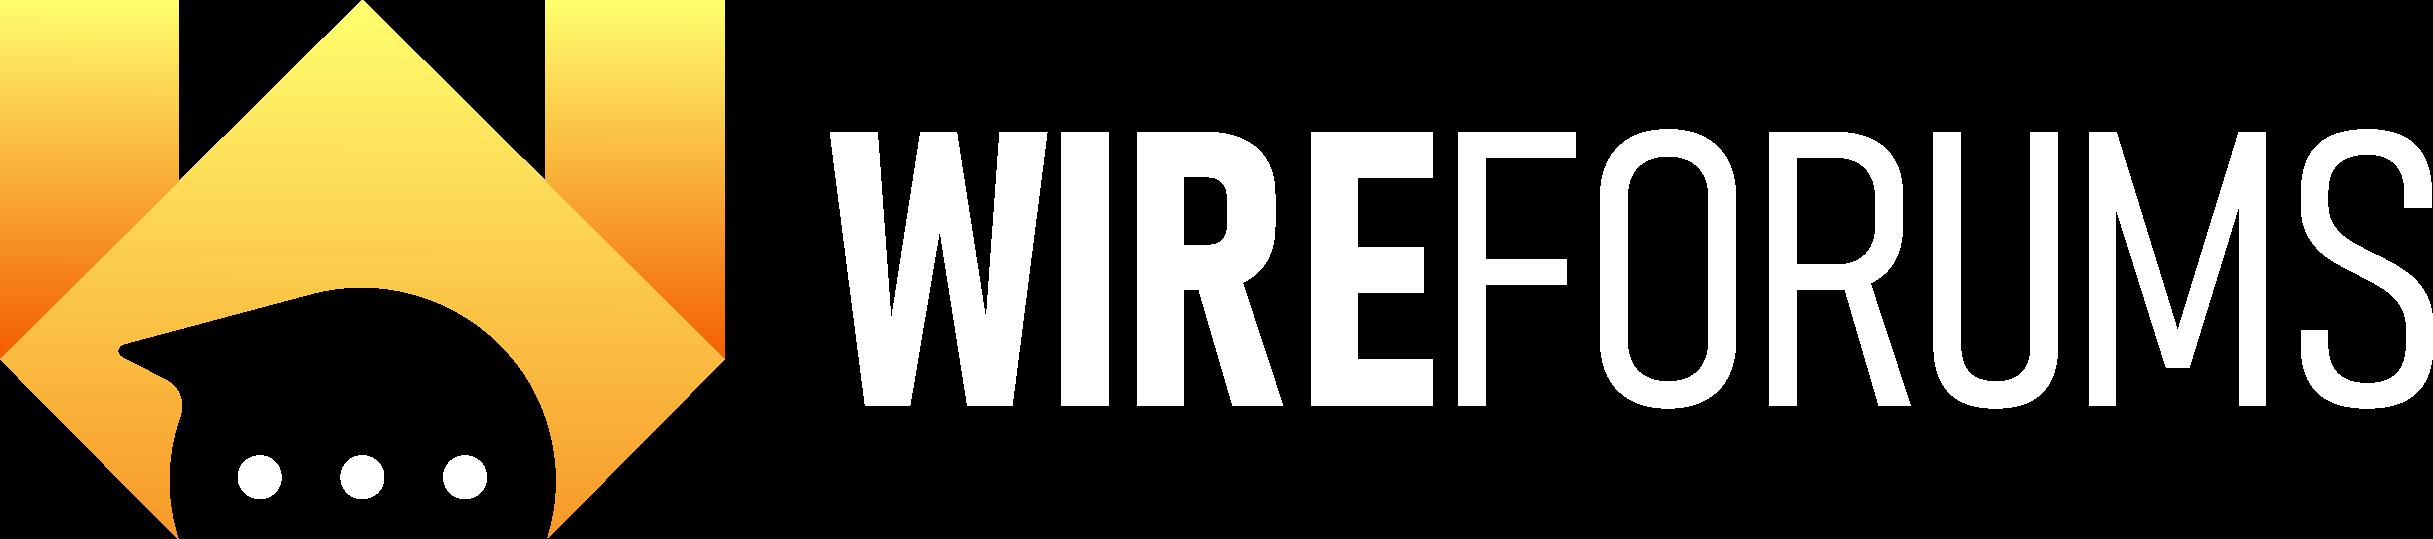 WireForums